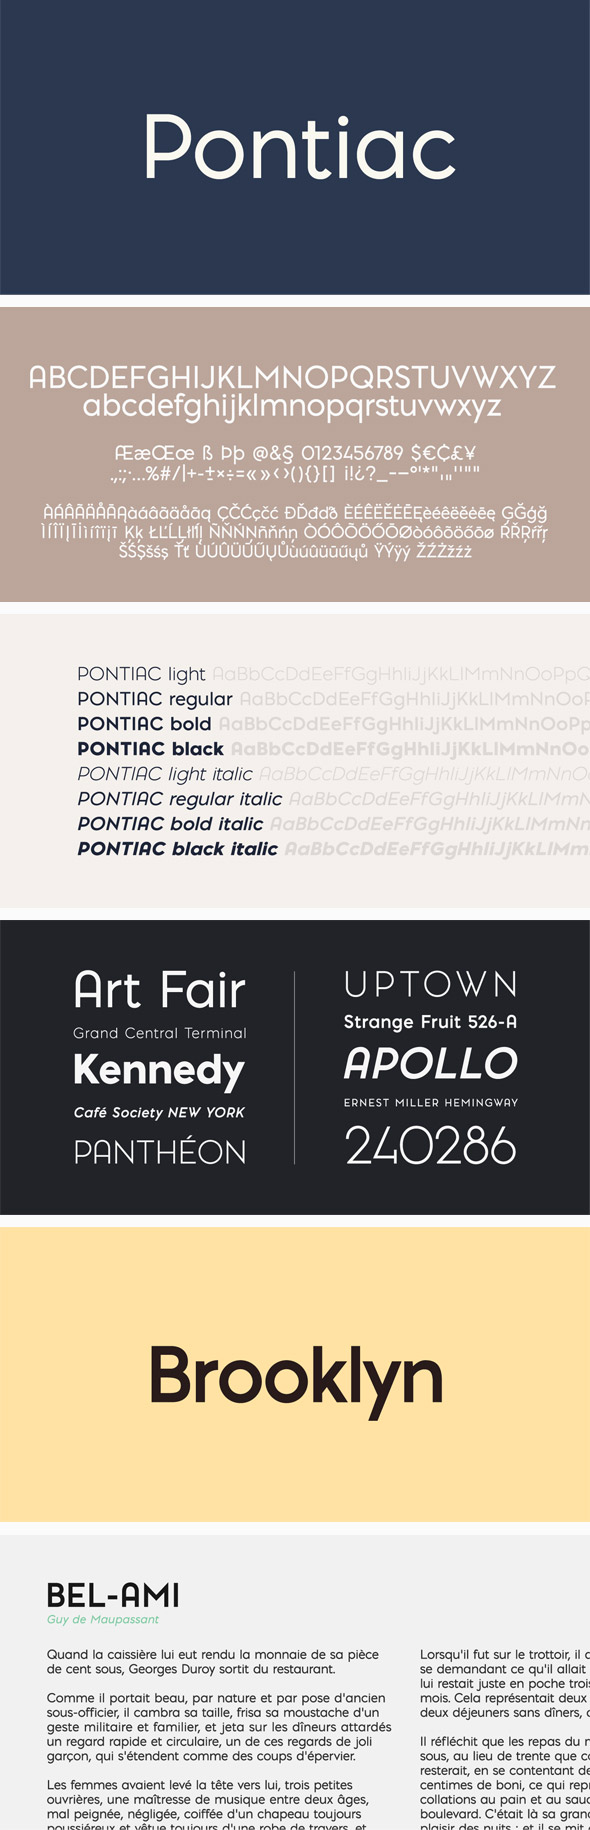 Pontiac Font Pack - Sans-Serif Fonts